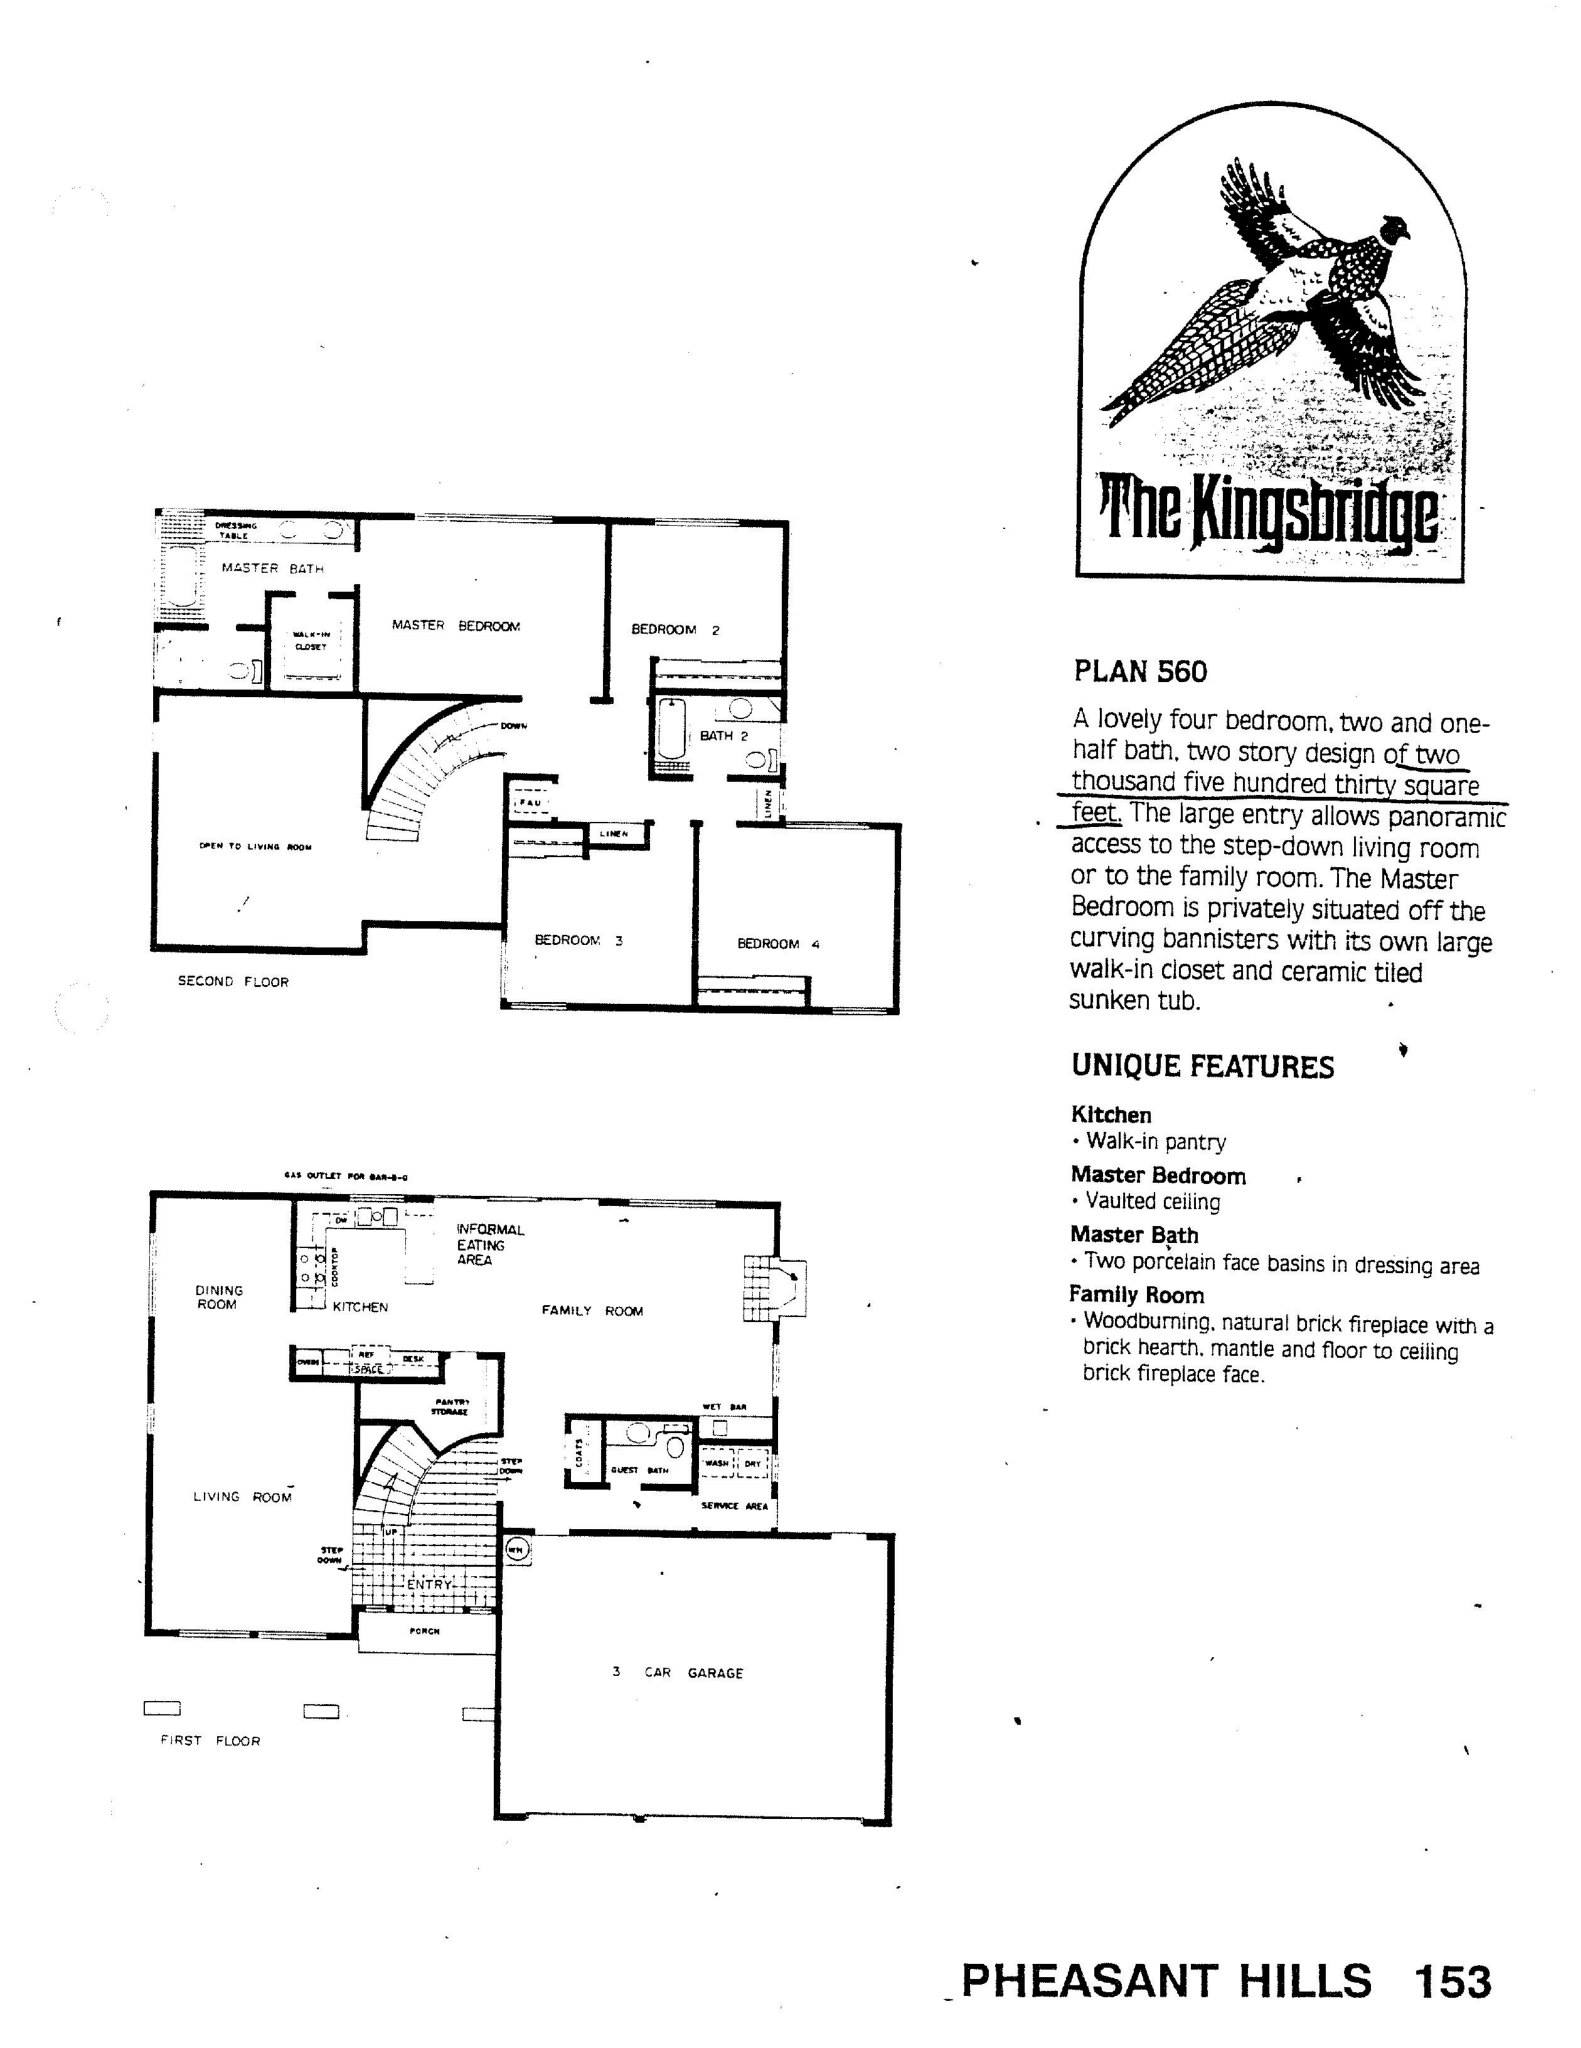 Pheasant Hills - The Kingsbridge - Plan 560